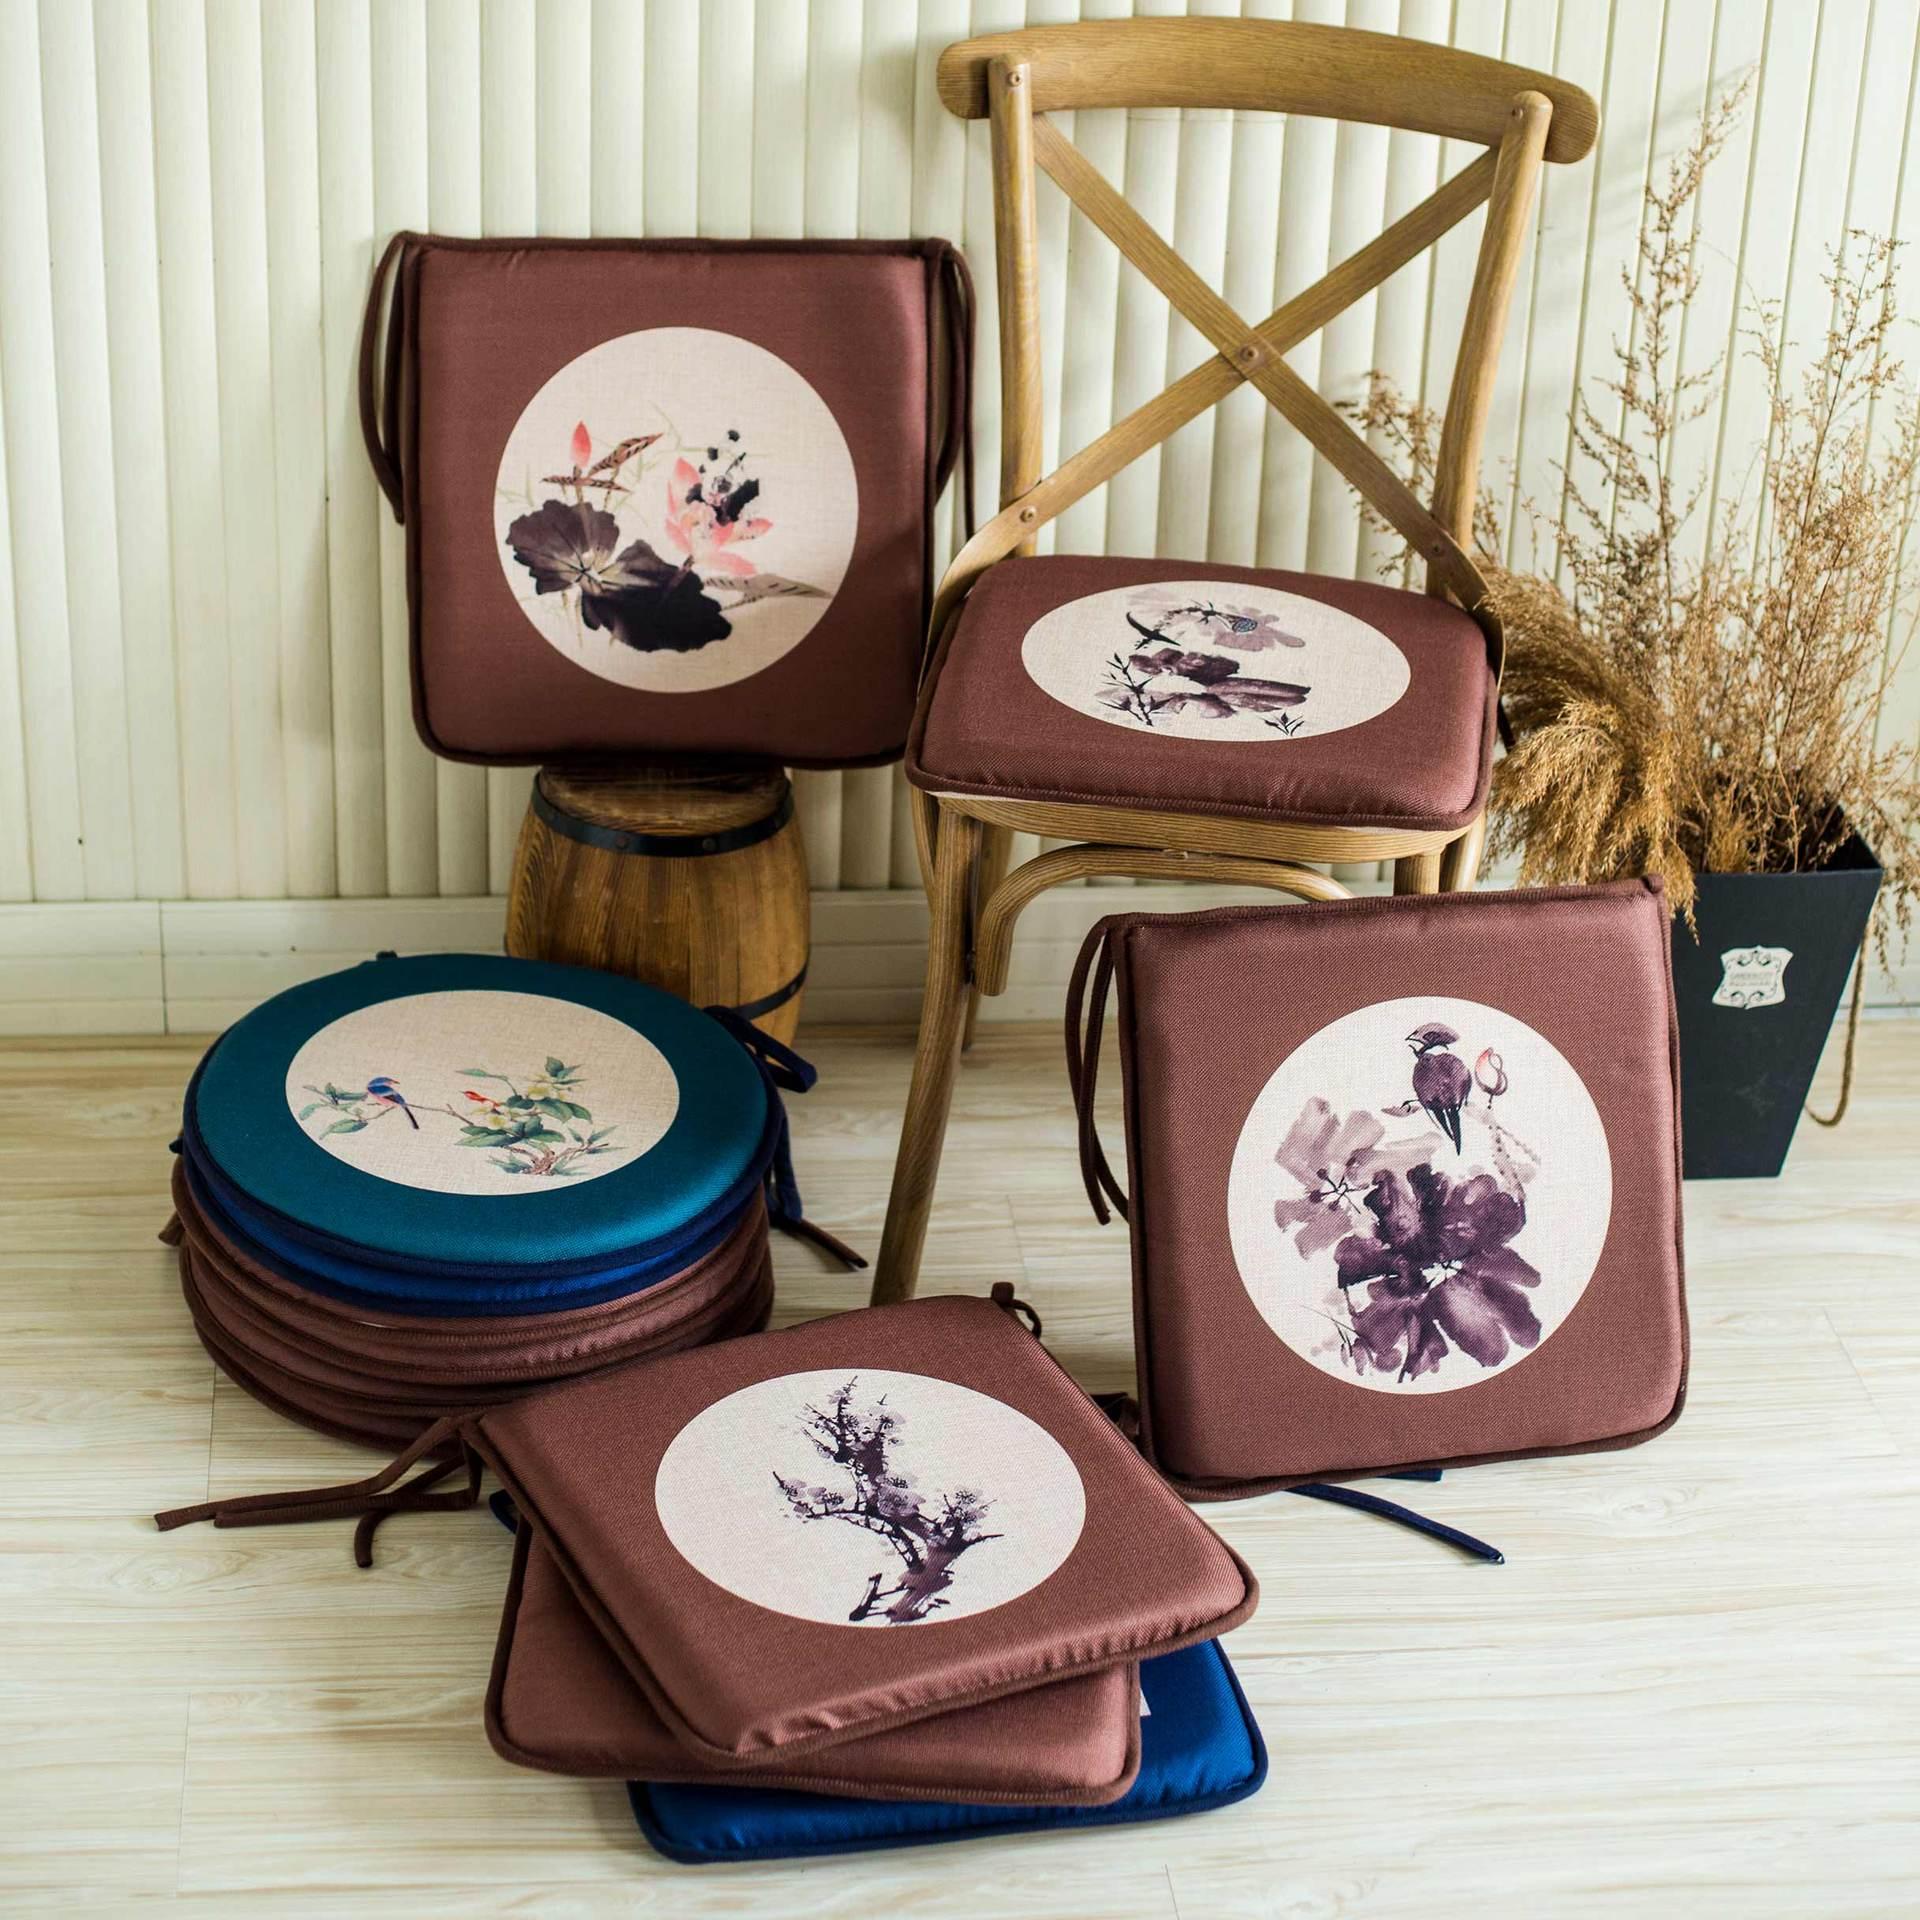 Chinese style Home Sofa Pillow Mahogany chair Cushion Pad Winter Office Bar Chair Back Seat Cushions Home Decor Seat Cushion